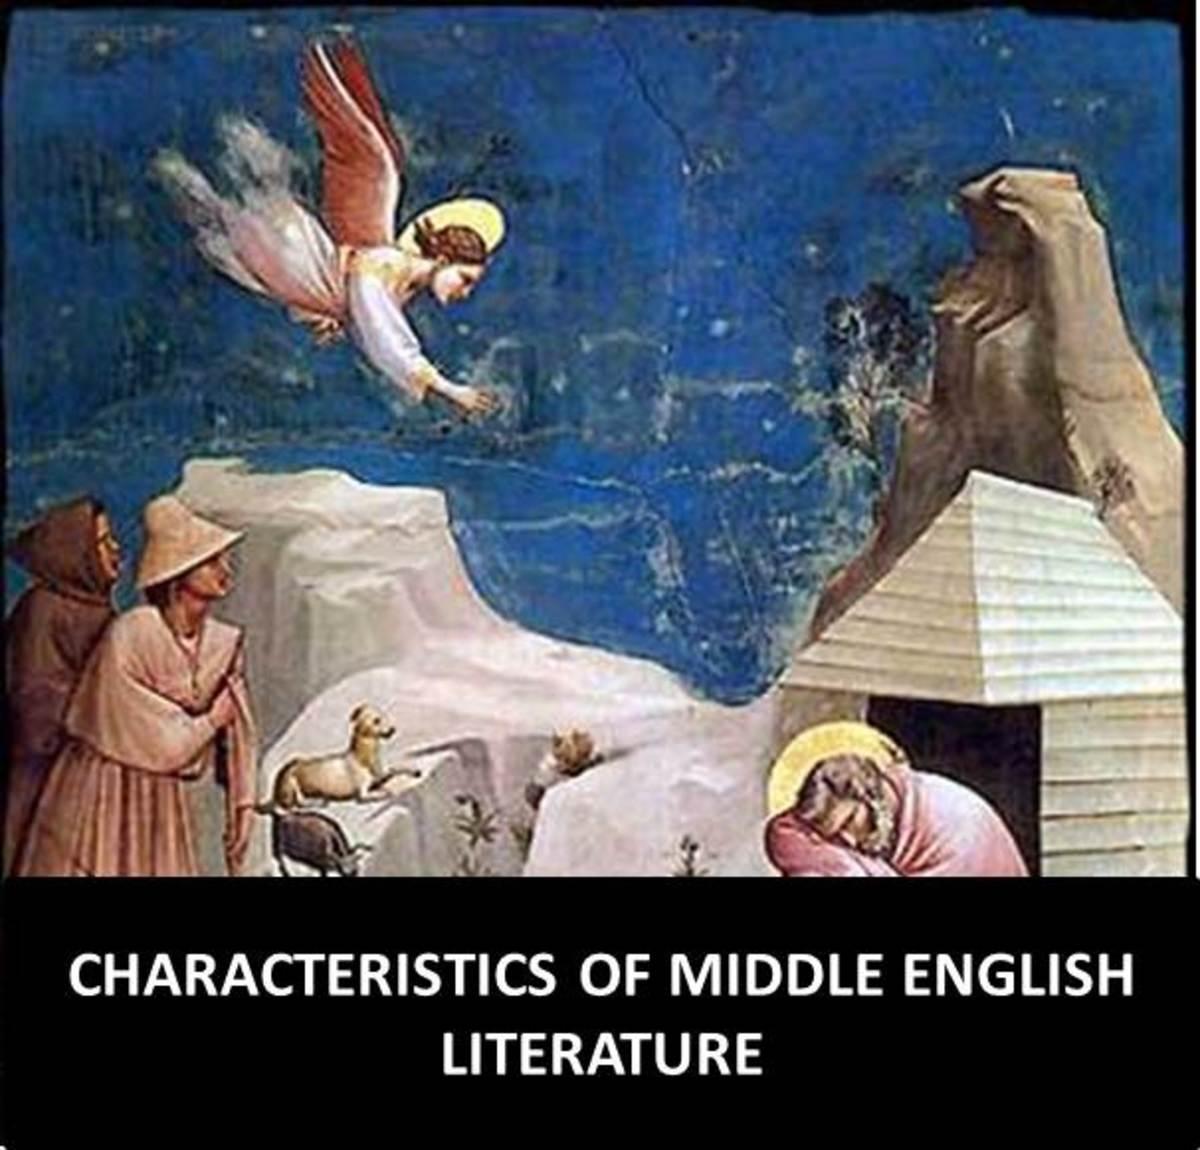 Characteristics of Middle English Literature